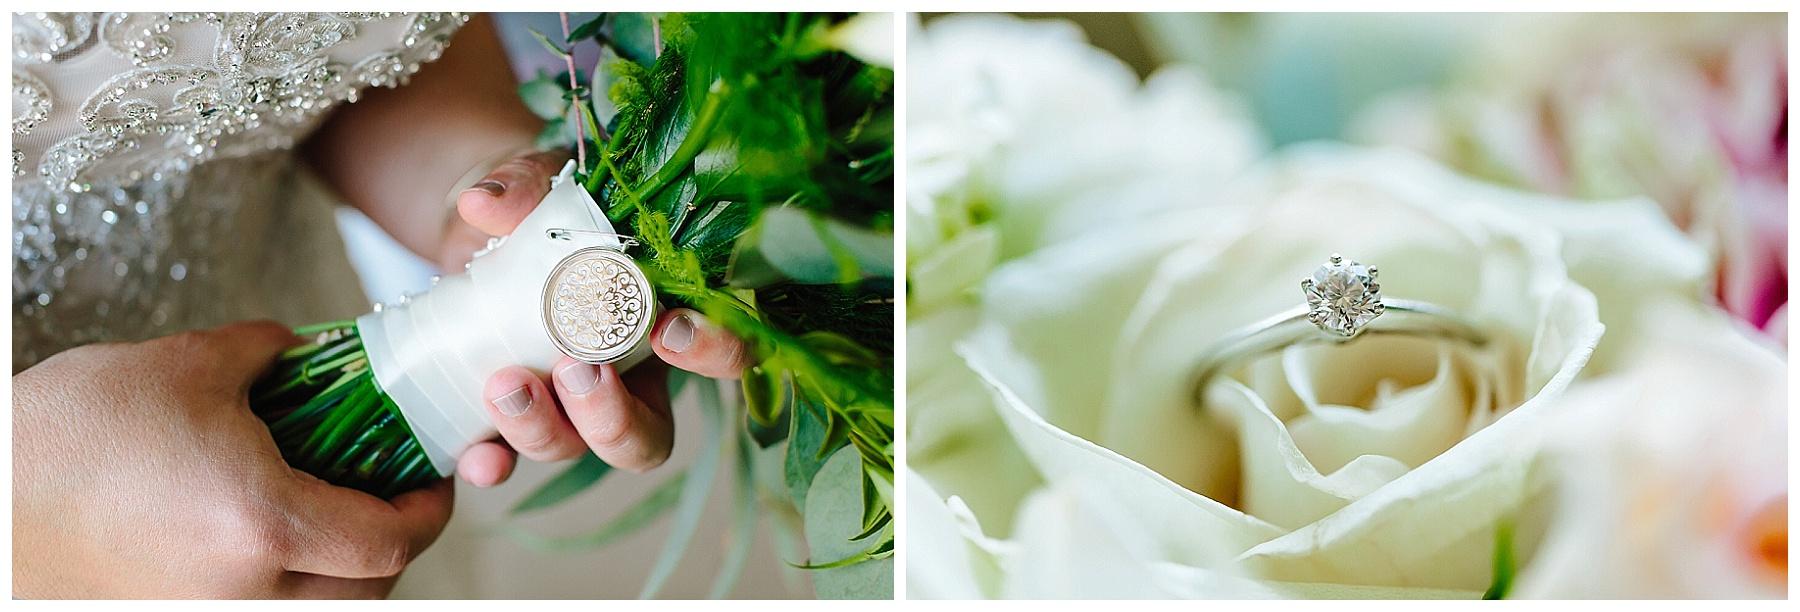 Wedding florist Perth